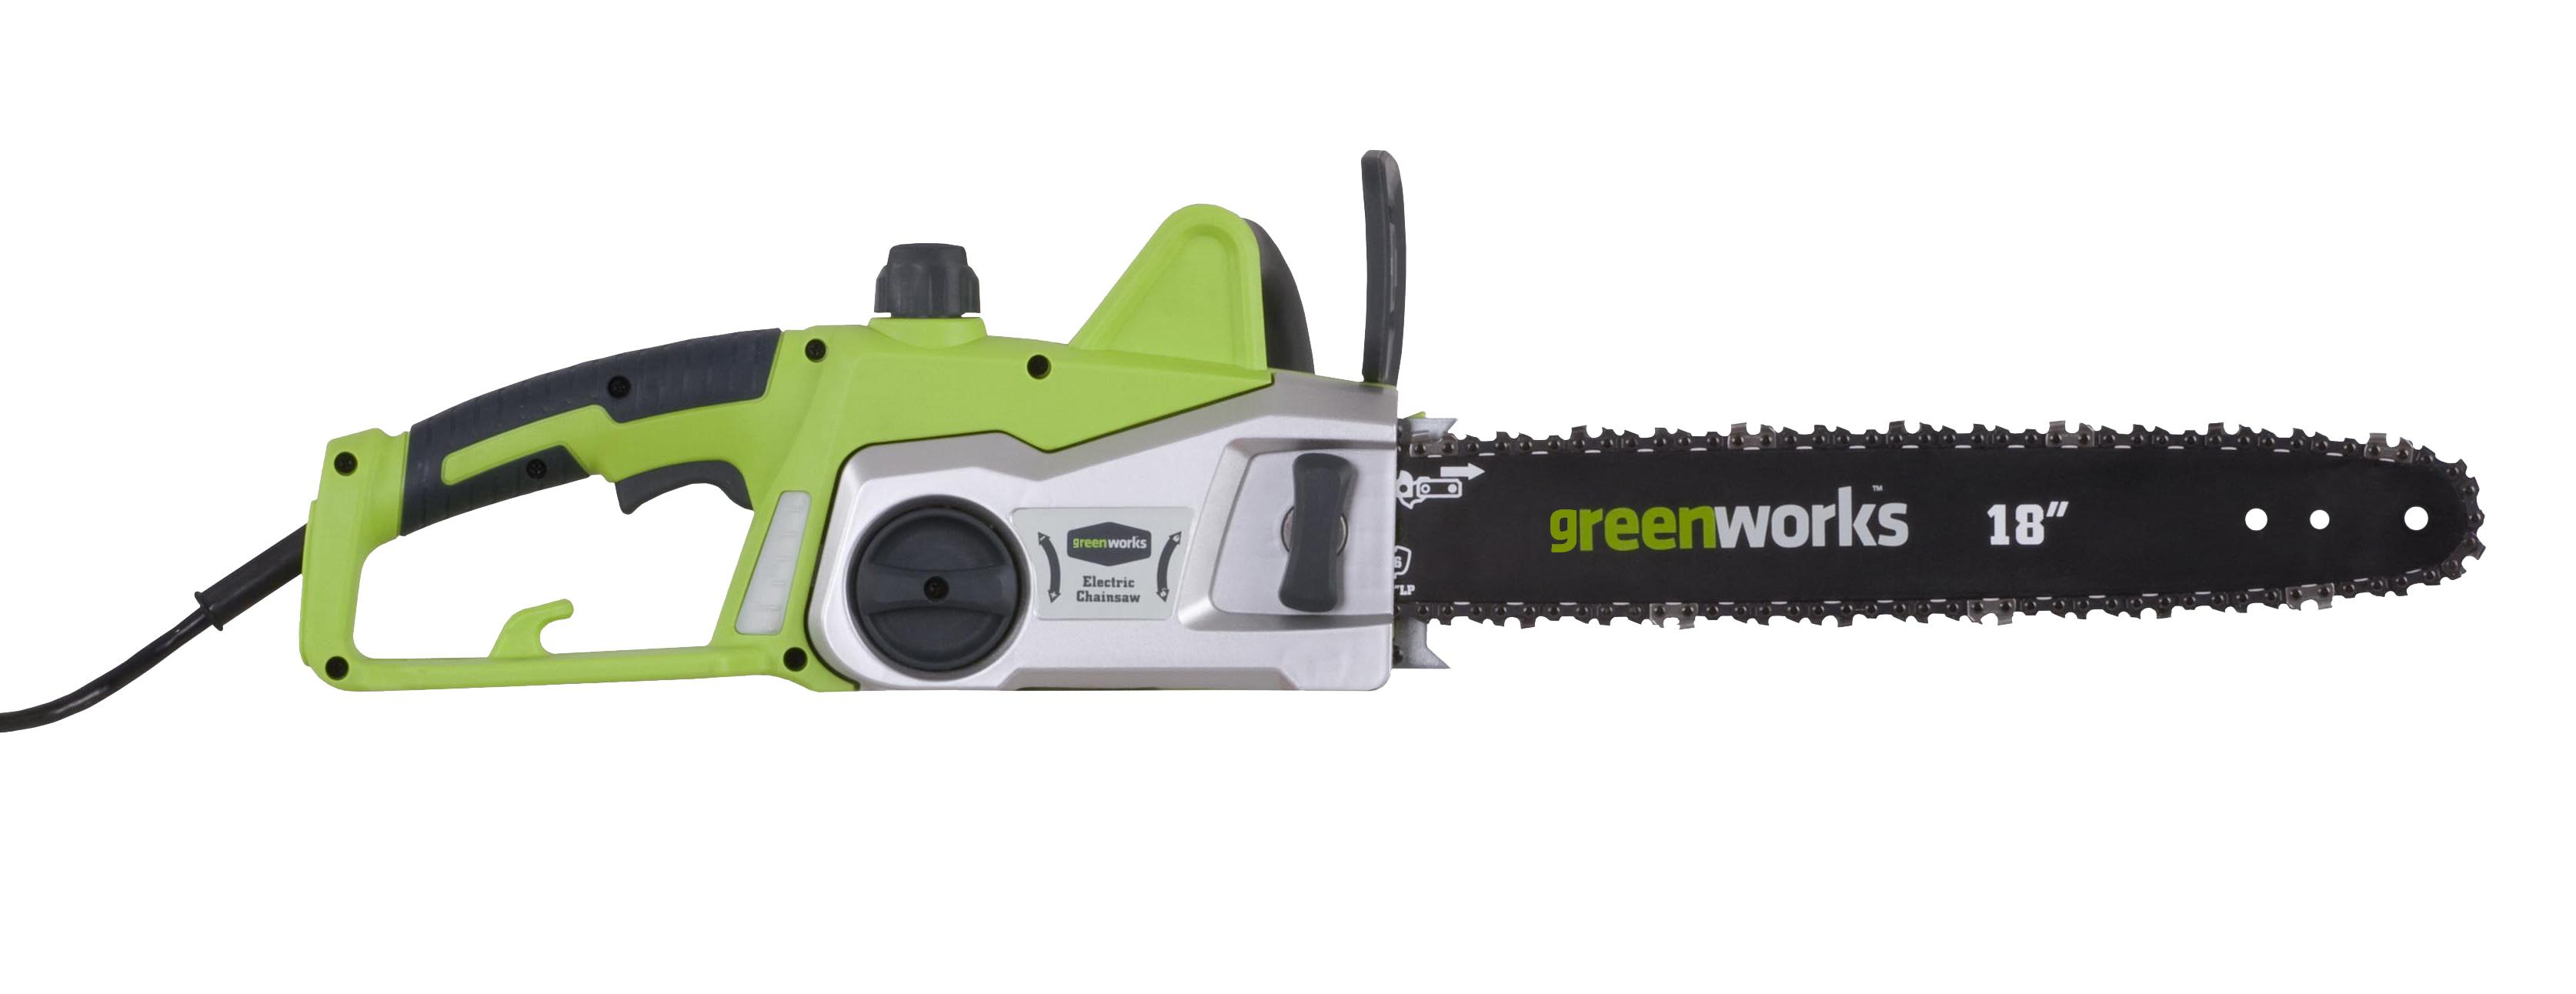 Greenworks GCS2046, reťazová píla s elektrickým motorom